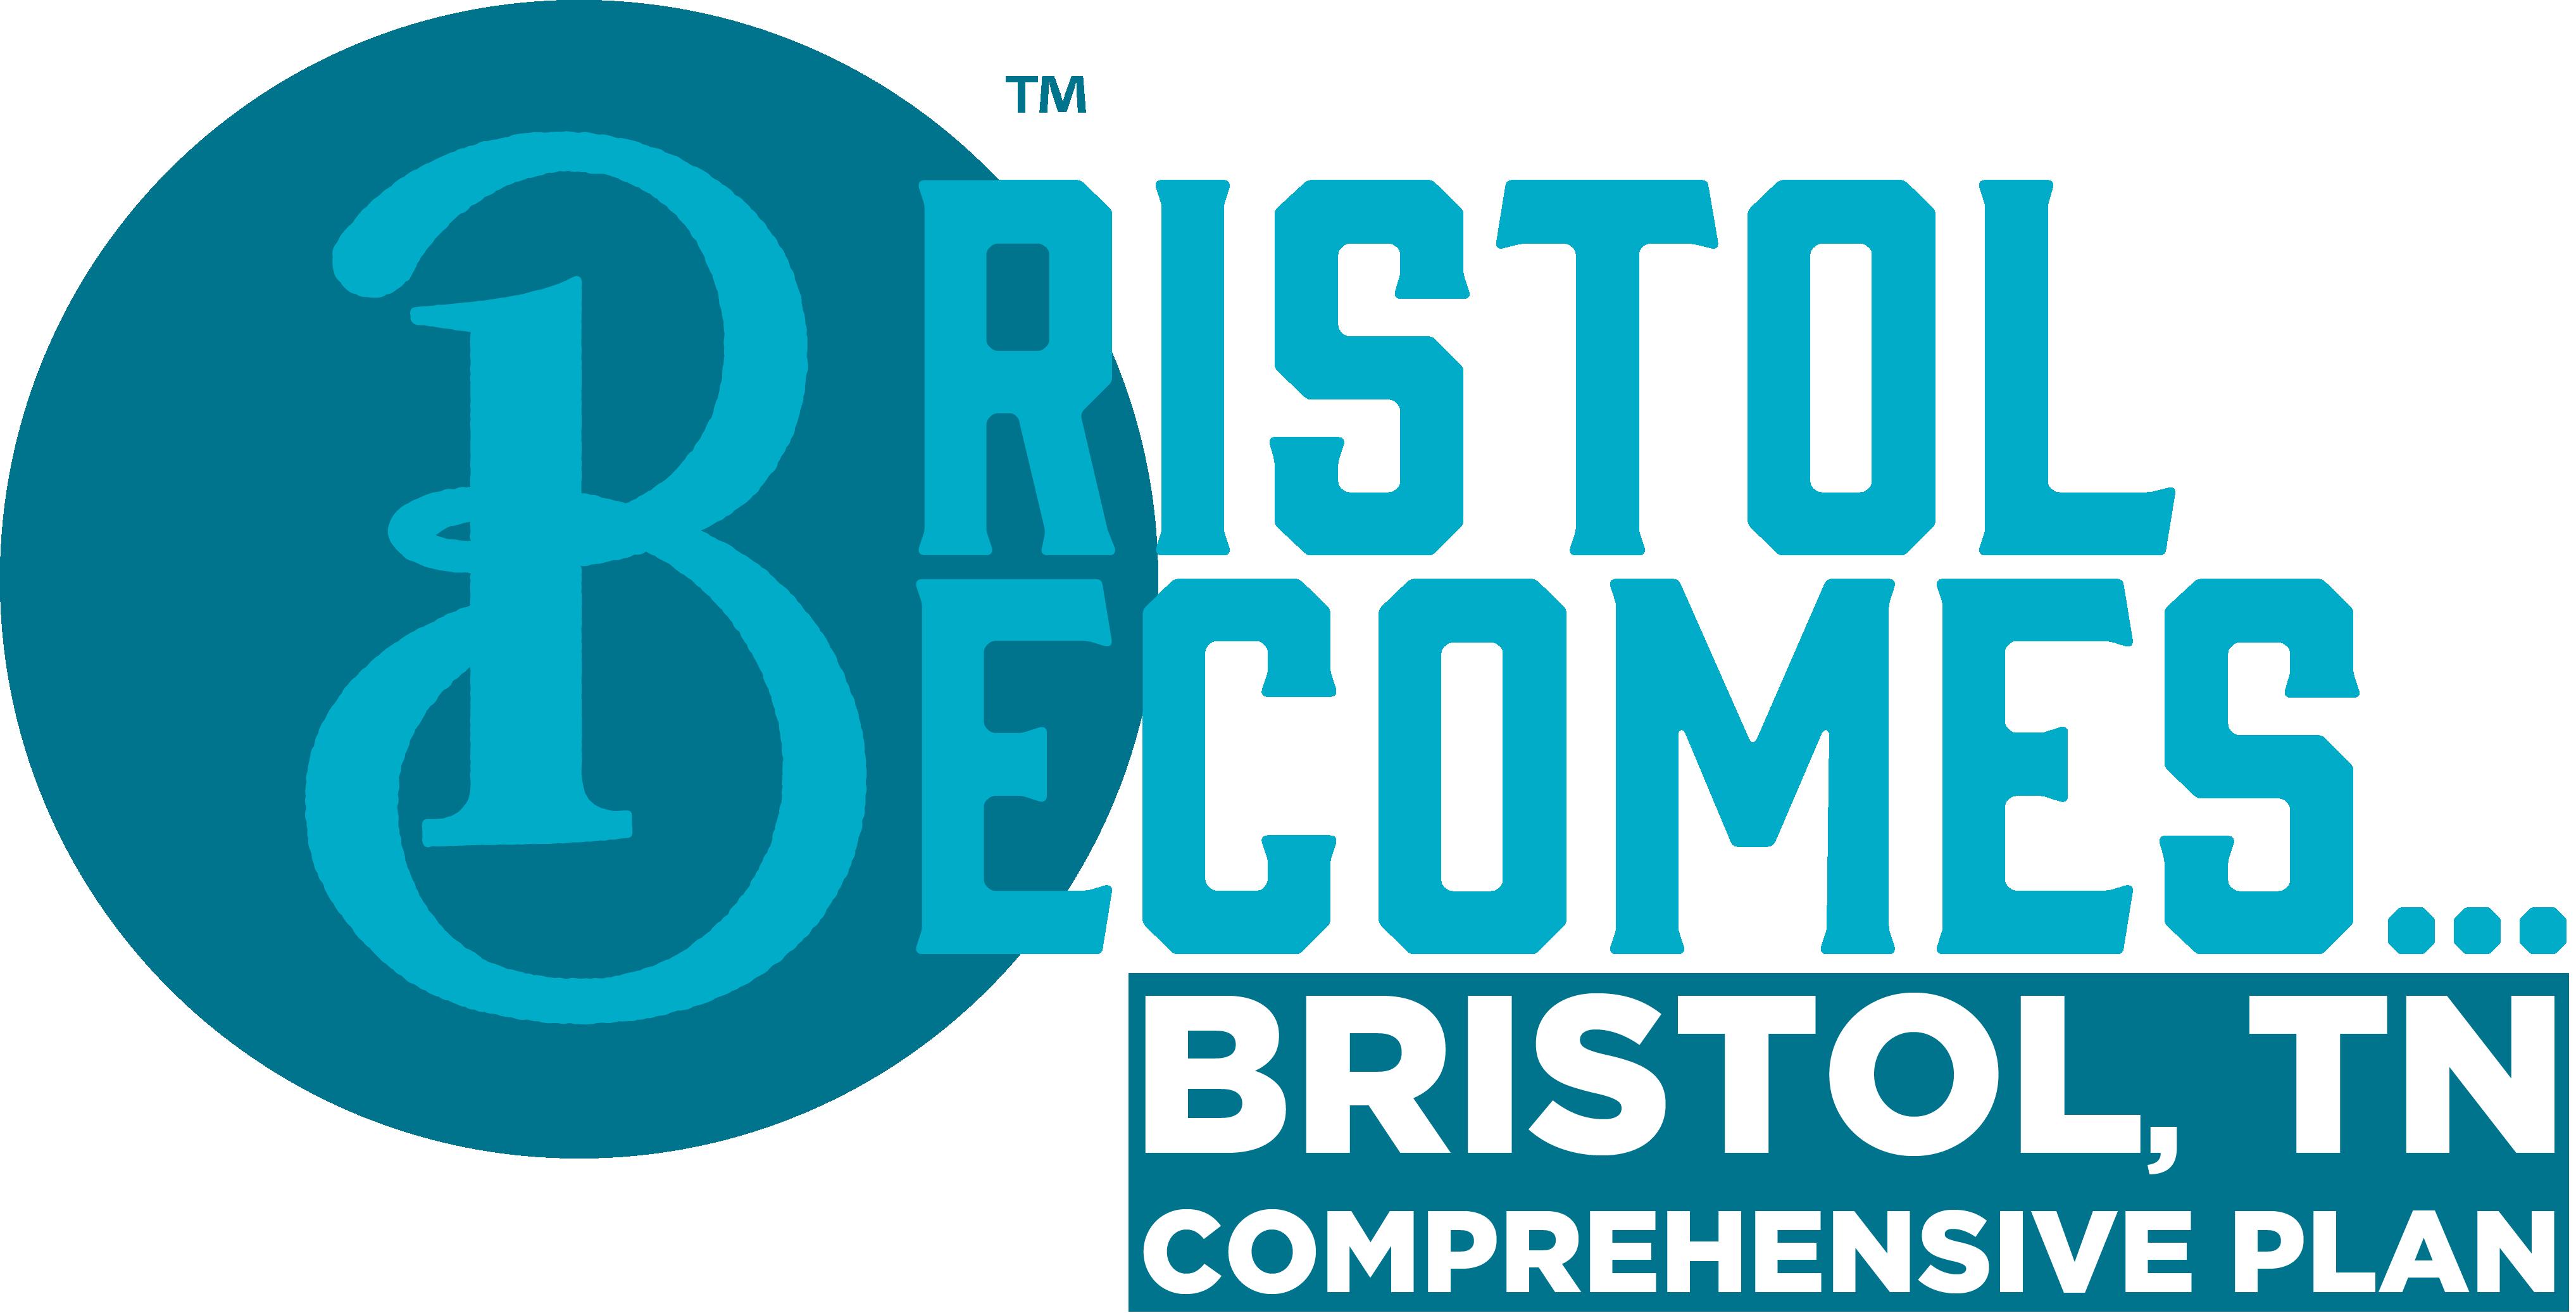 Bristol tn comprehensive plan mapcial get involved in bristols future here publicscrutiny Gallery